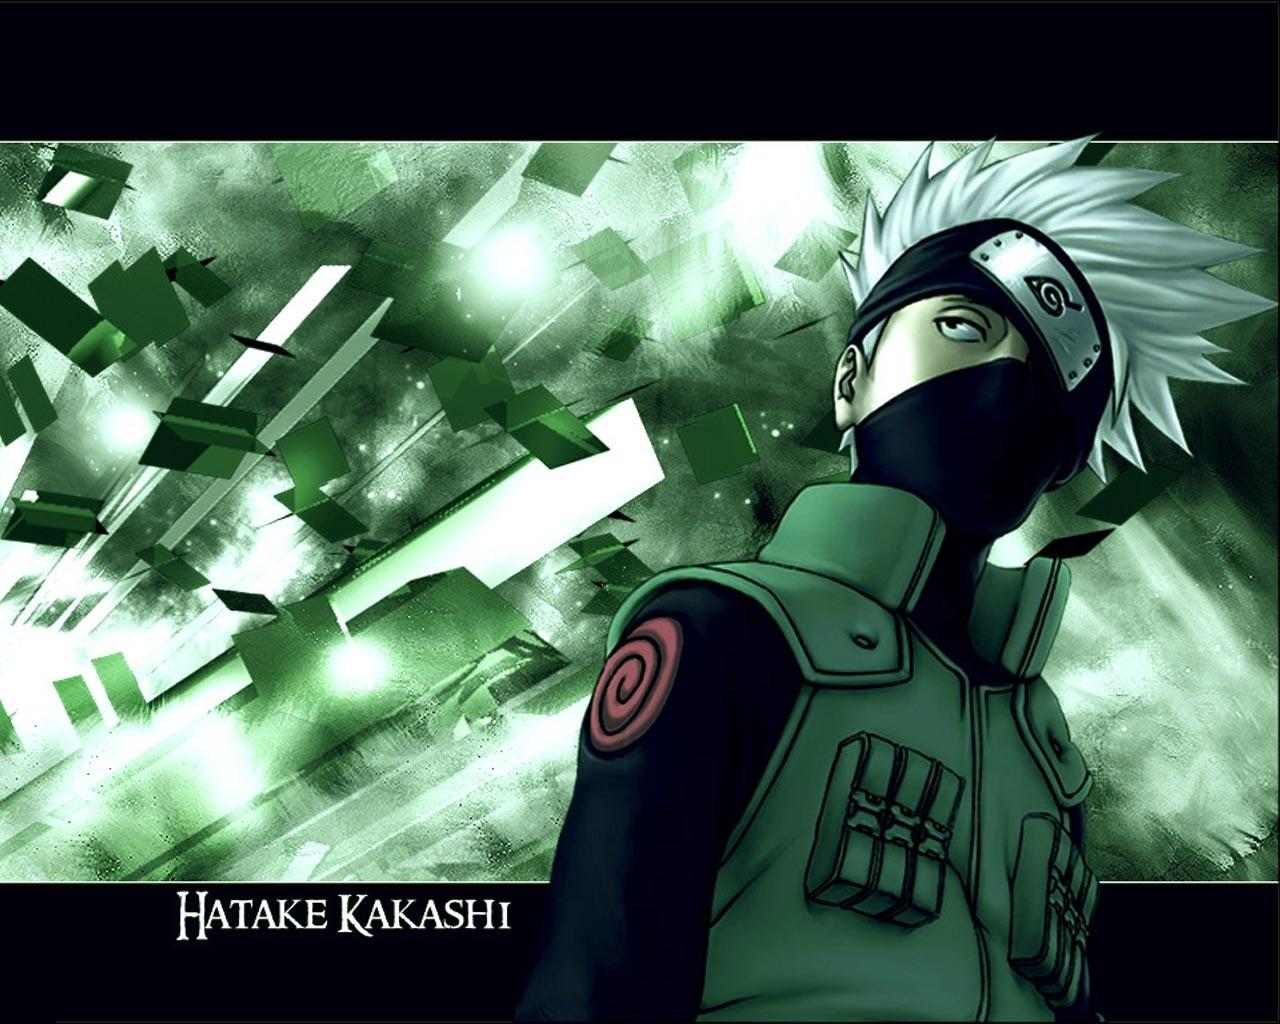 Hatake Kakashi Wallpaper 1280x1024